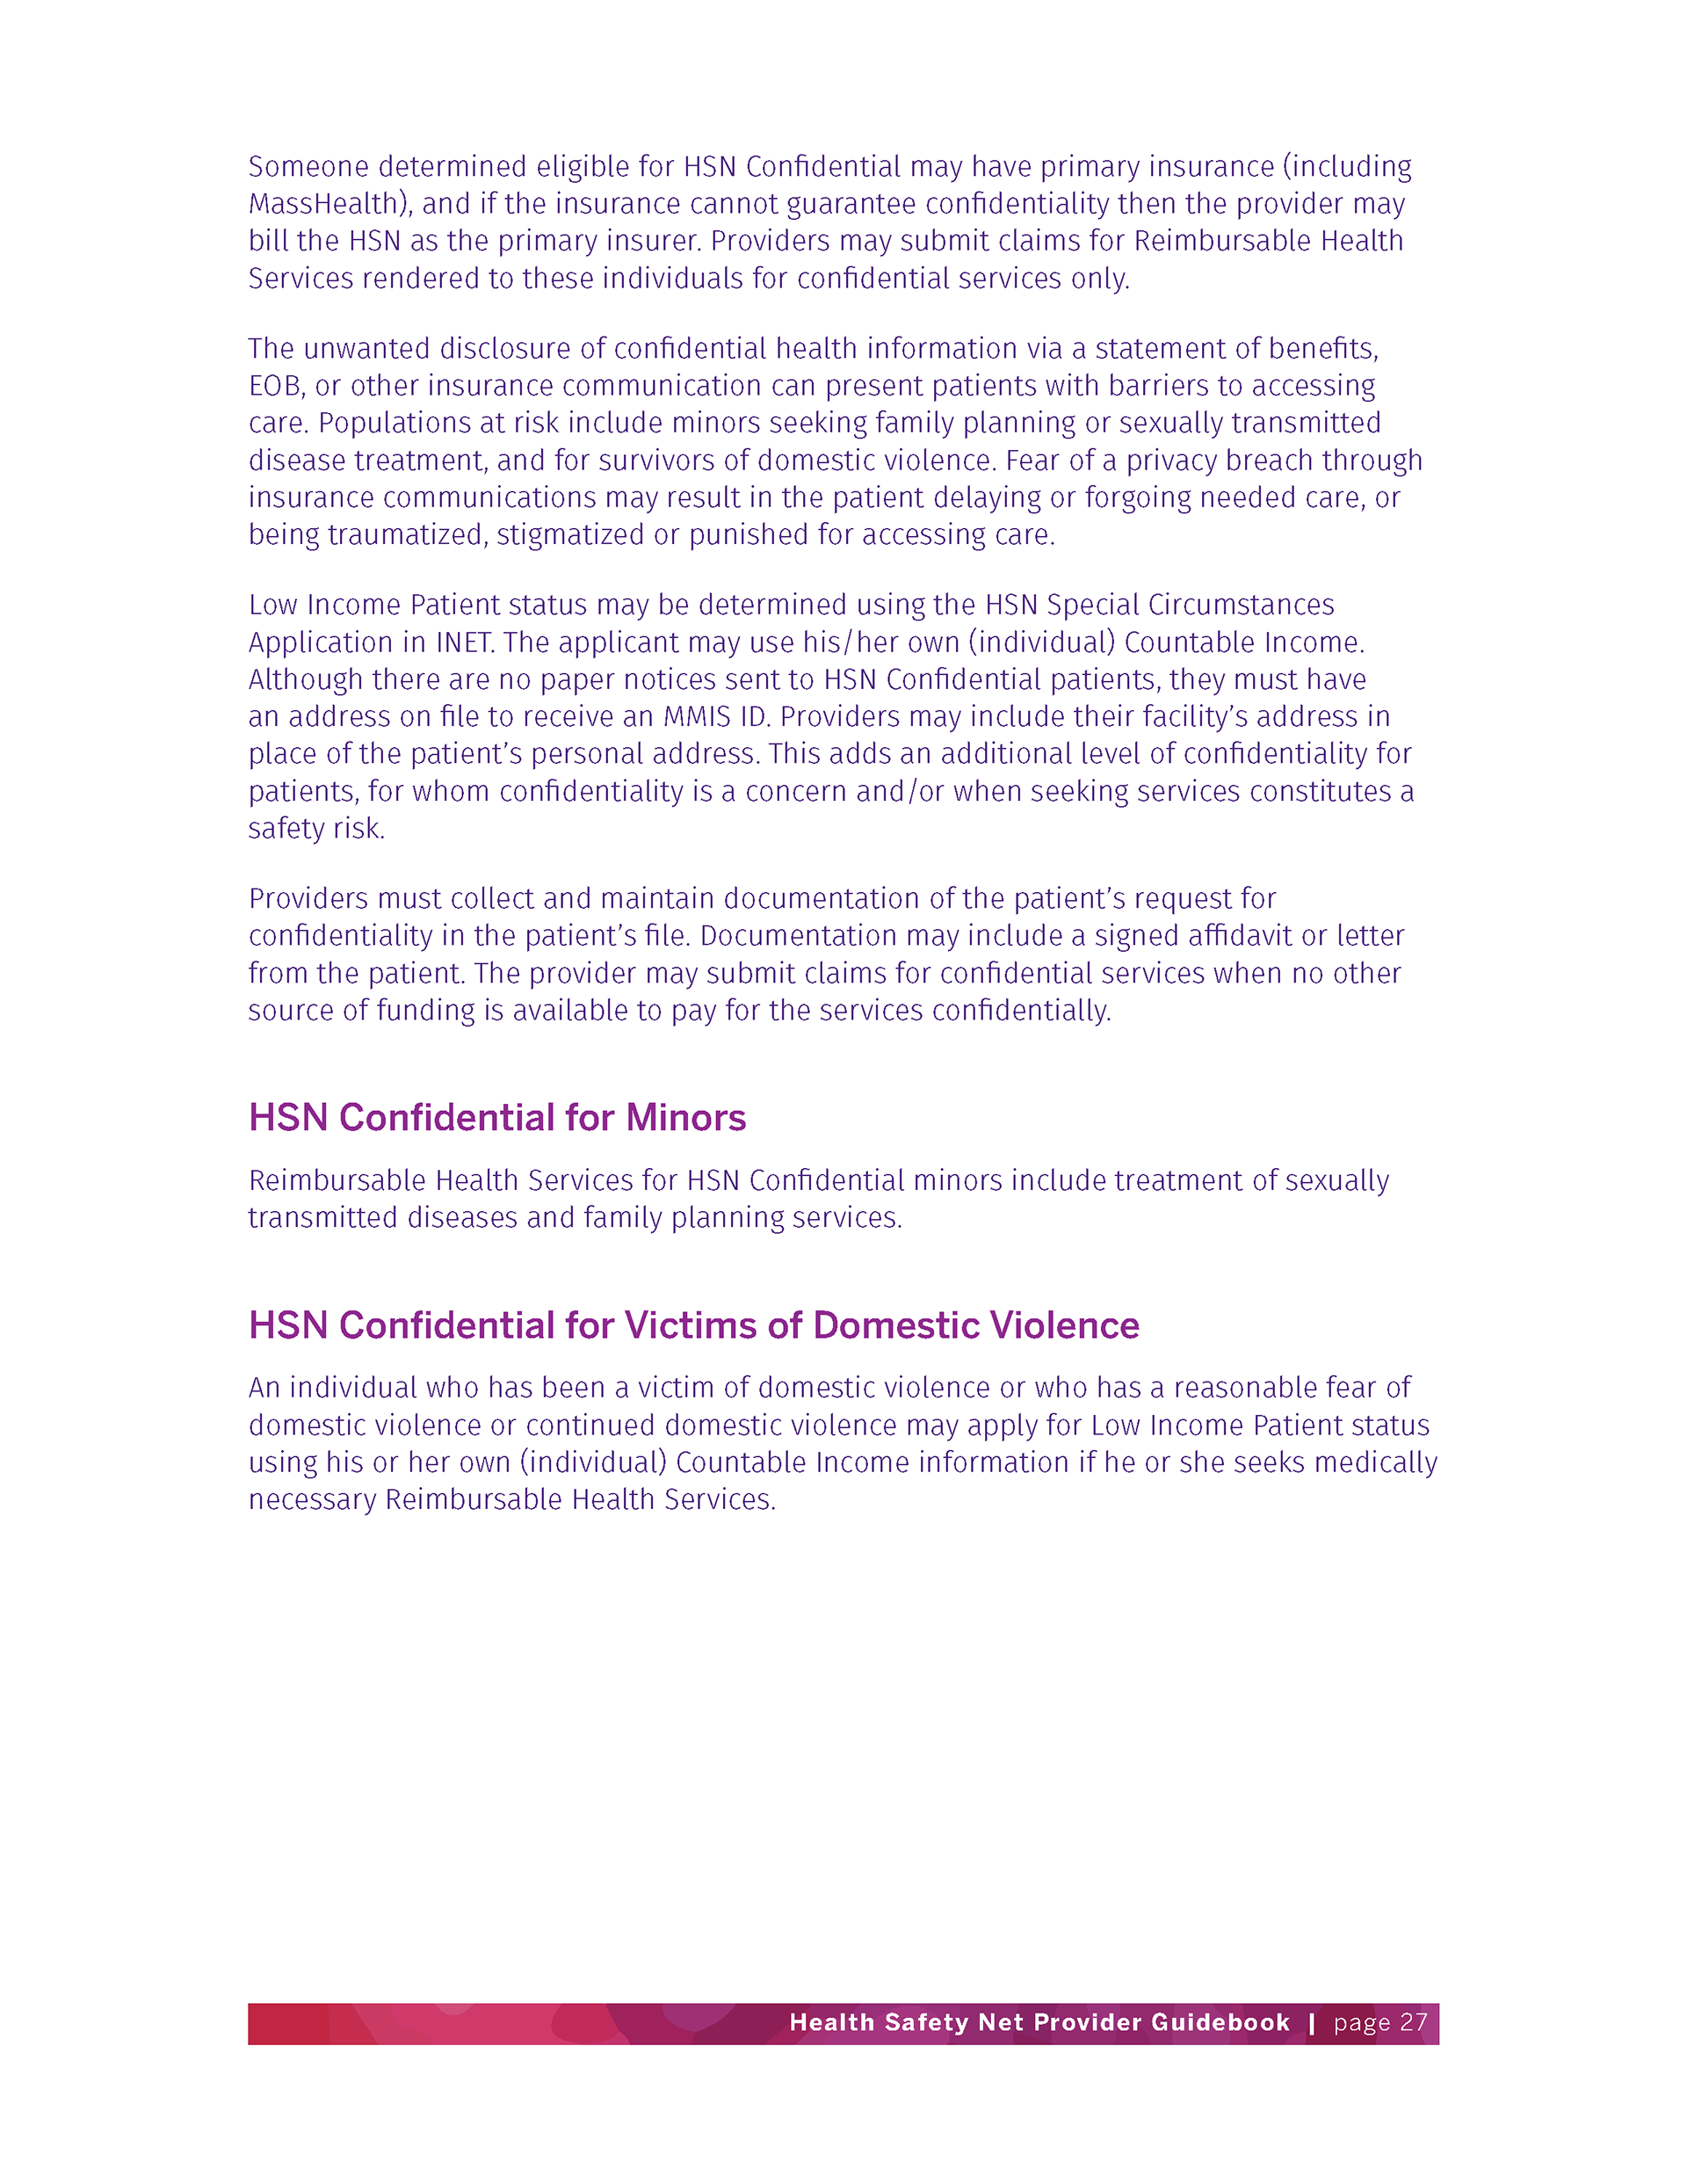 Lucia Colella Yantosca Health Safety Network Booklet